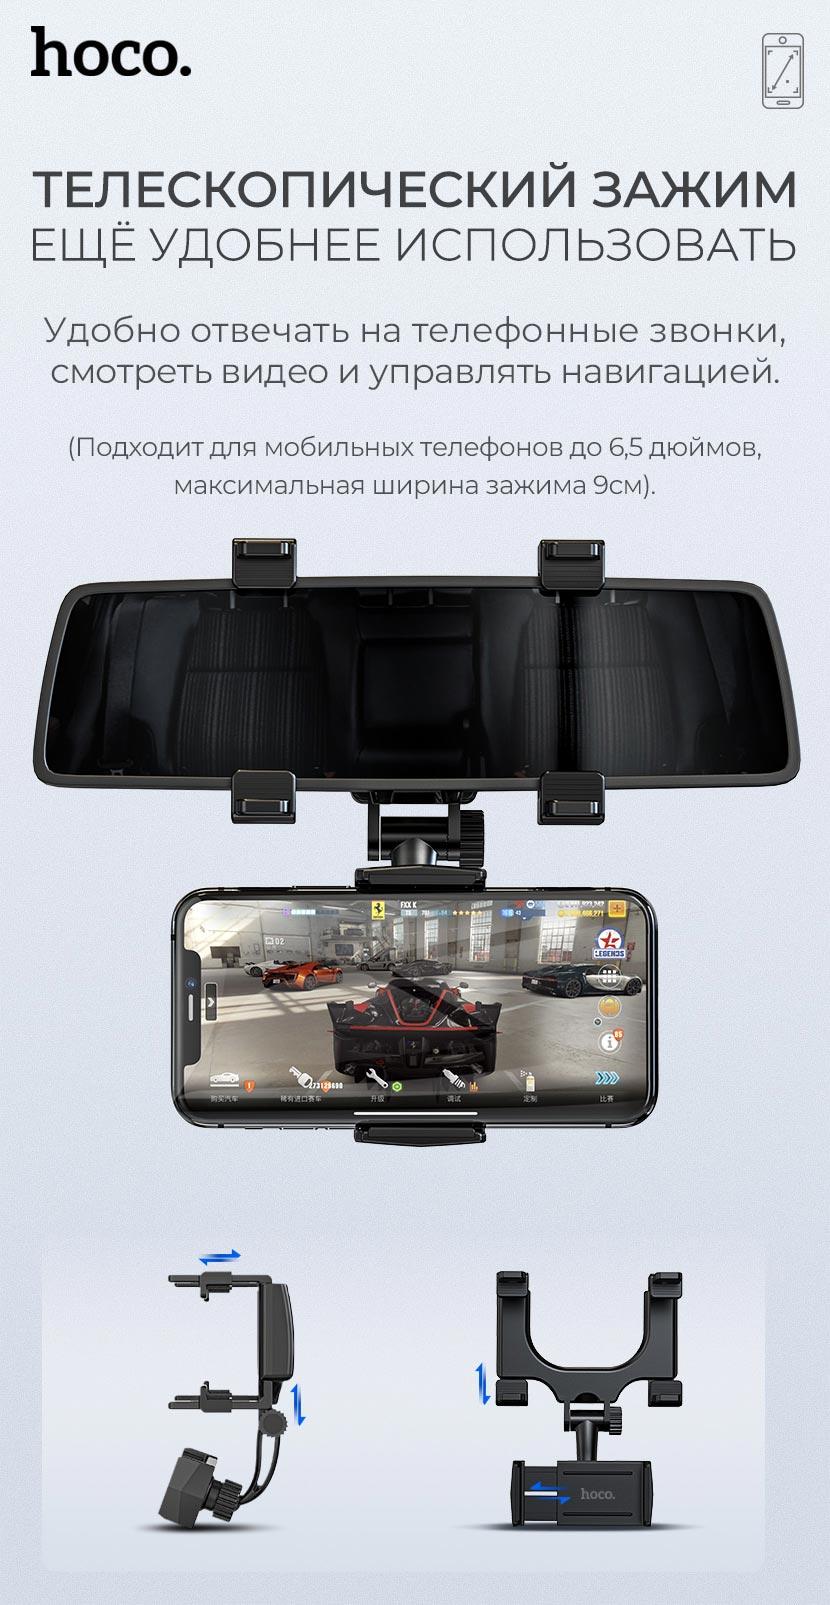 hoco news ca70 pilot in car rearview mirror mount holder telescopic ru